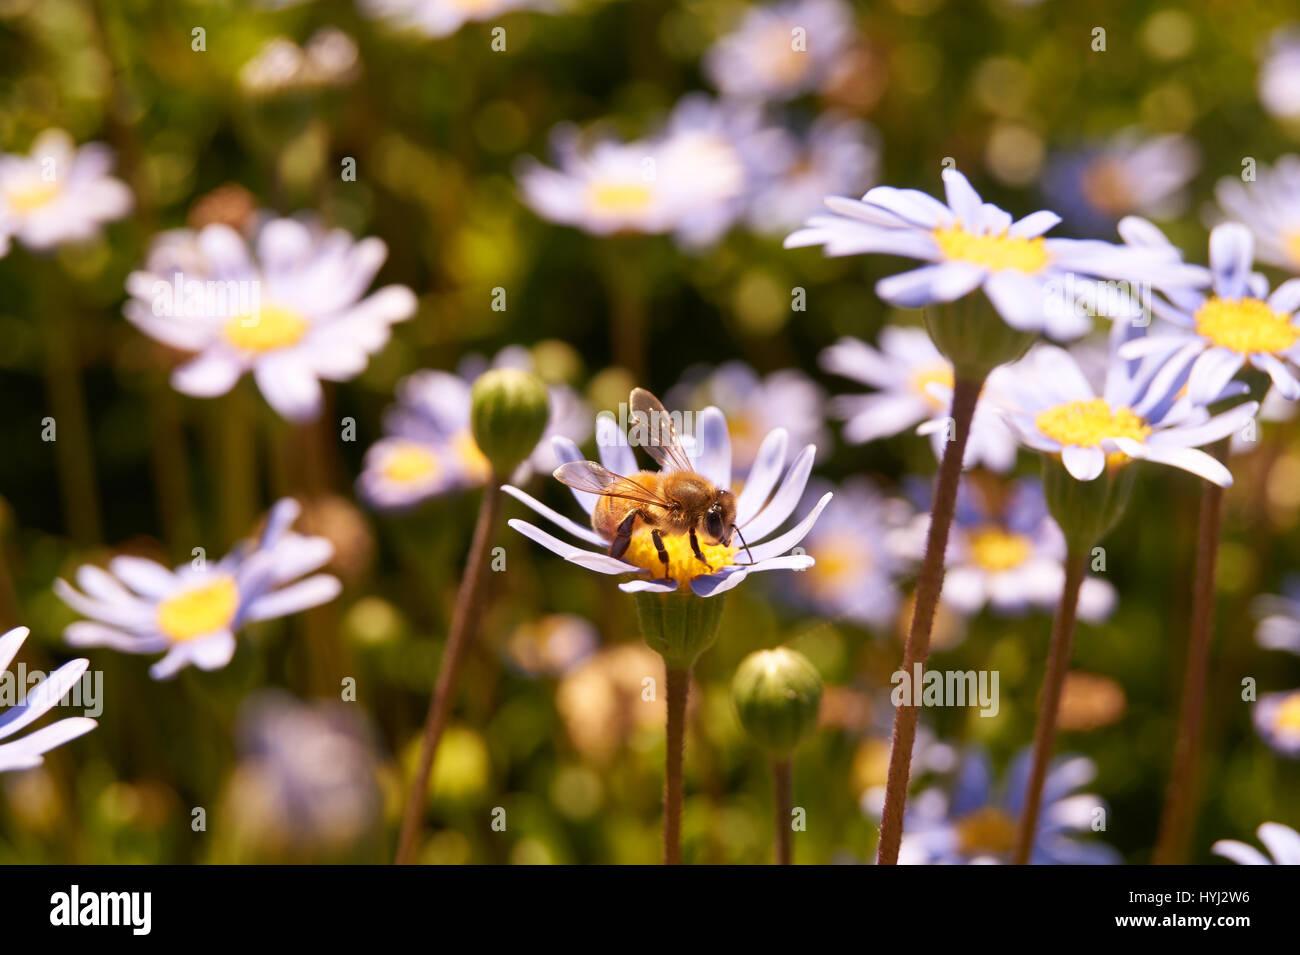 Cerca de abeja en daisy Imagen De Stock